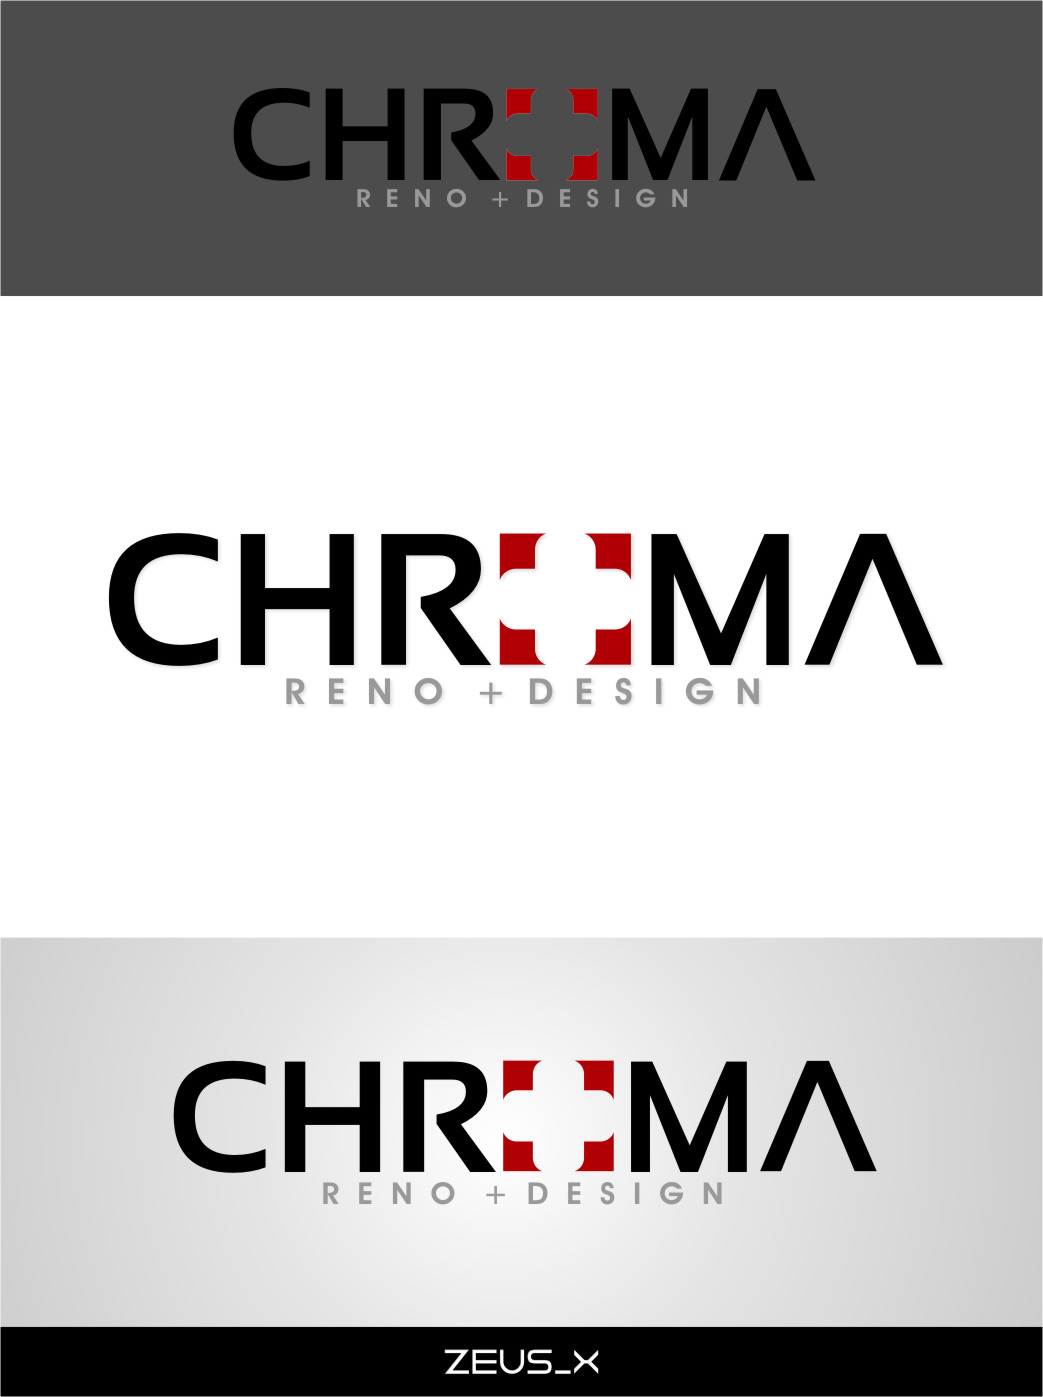 Logo Design by Ngepet_art - Entry No. 225 in the Logo Design Contest Inspiring Logo Design for Chroma Reno+Design.